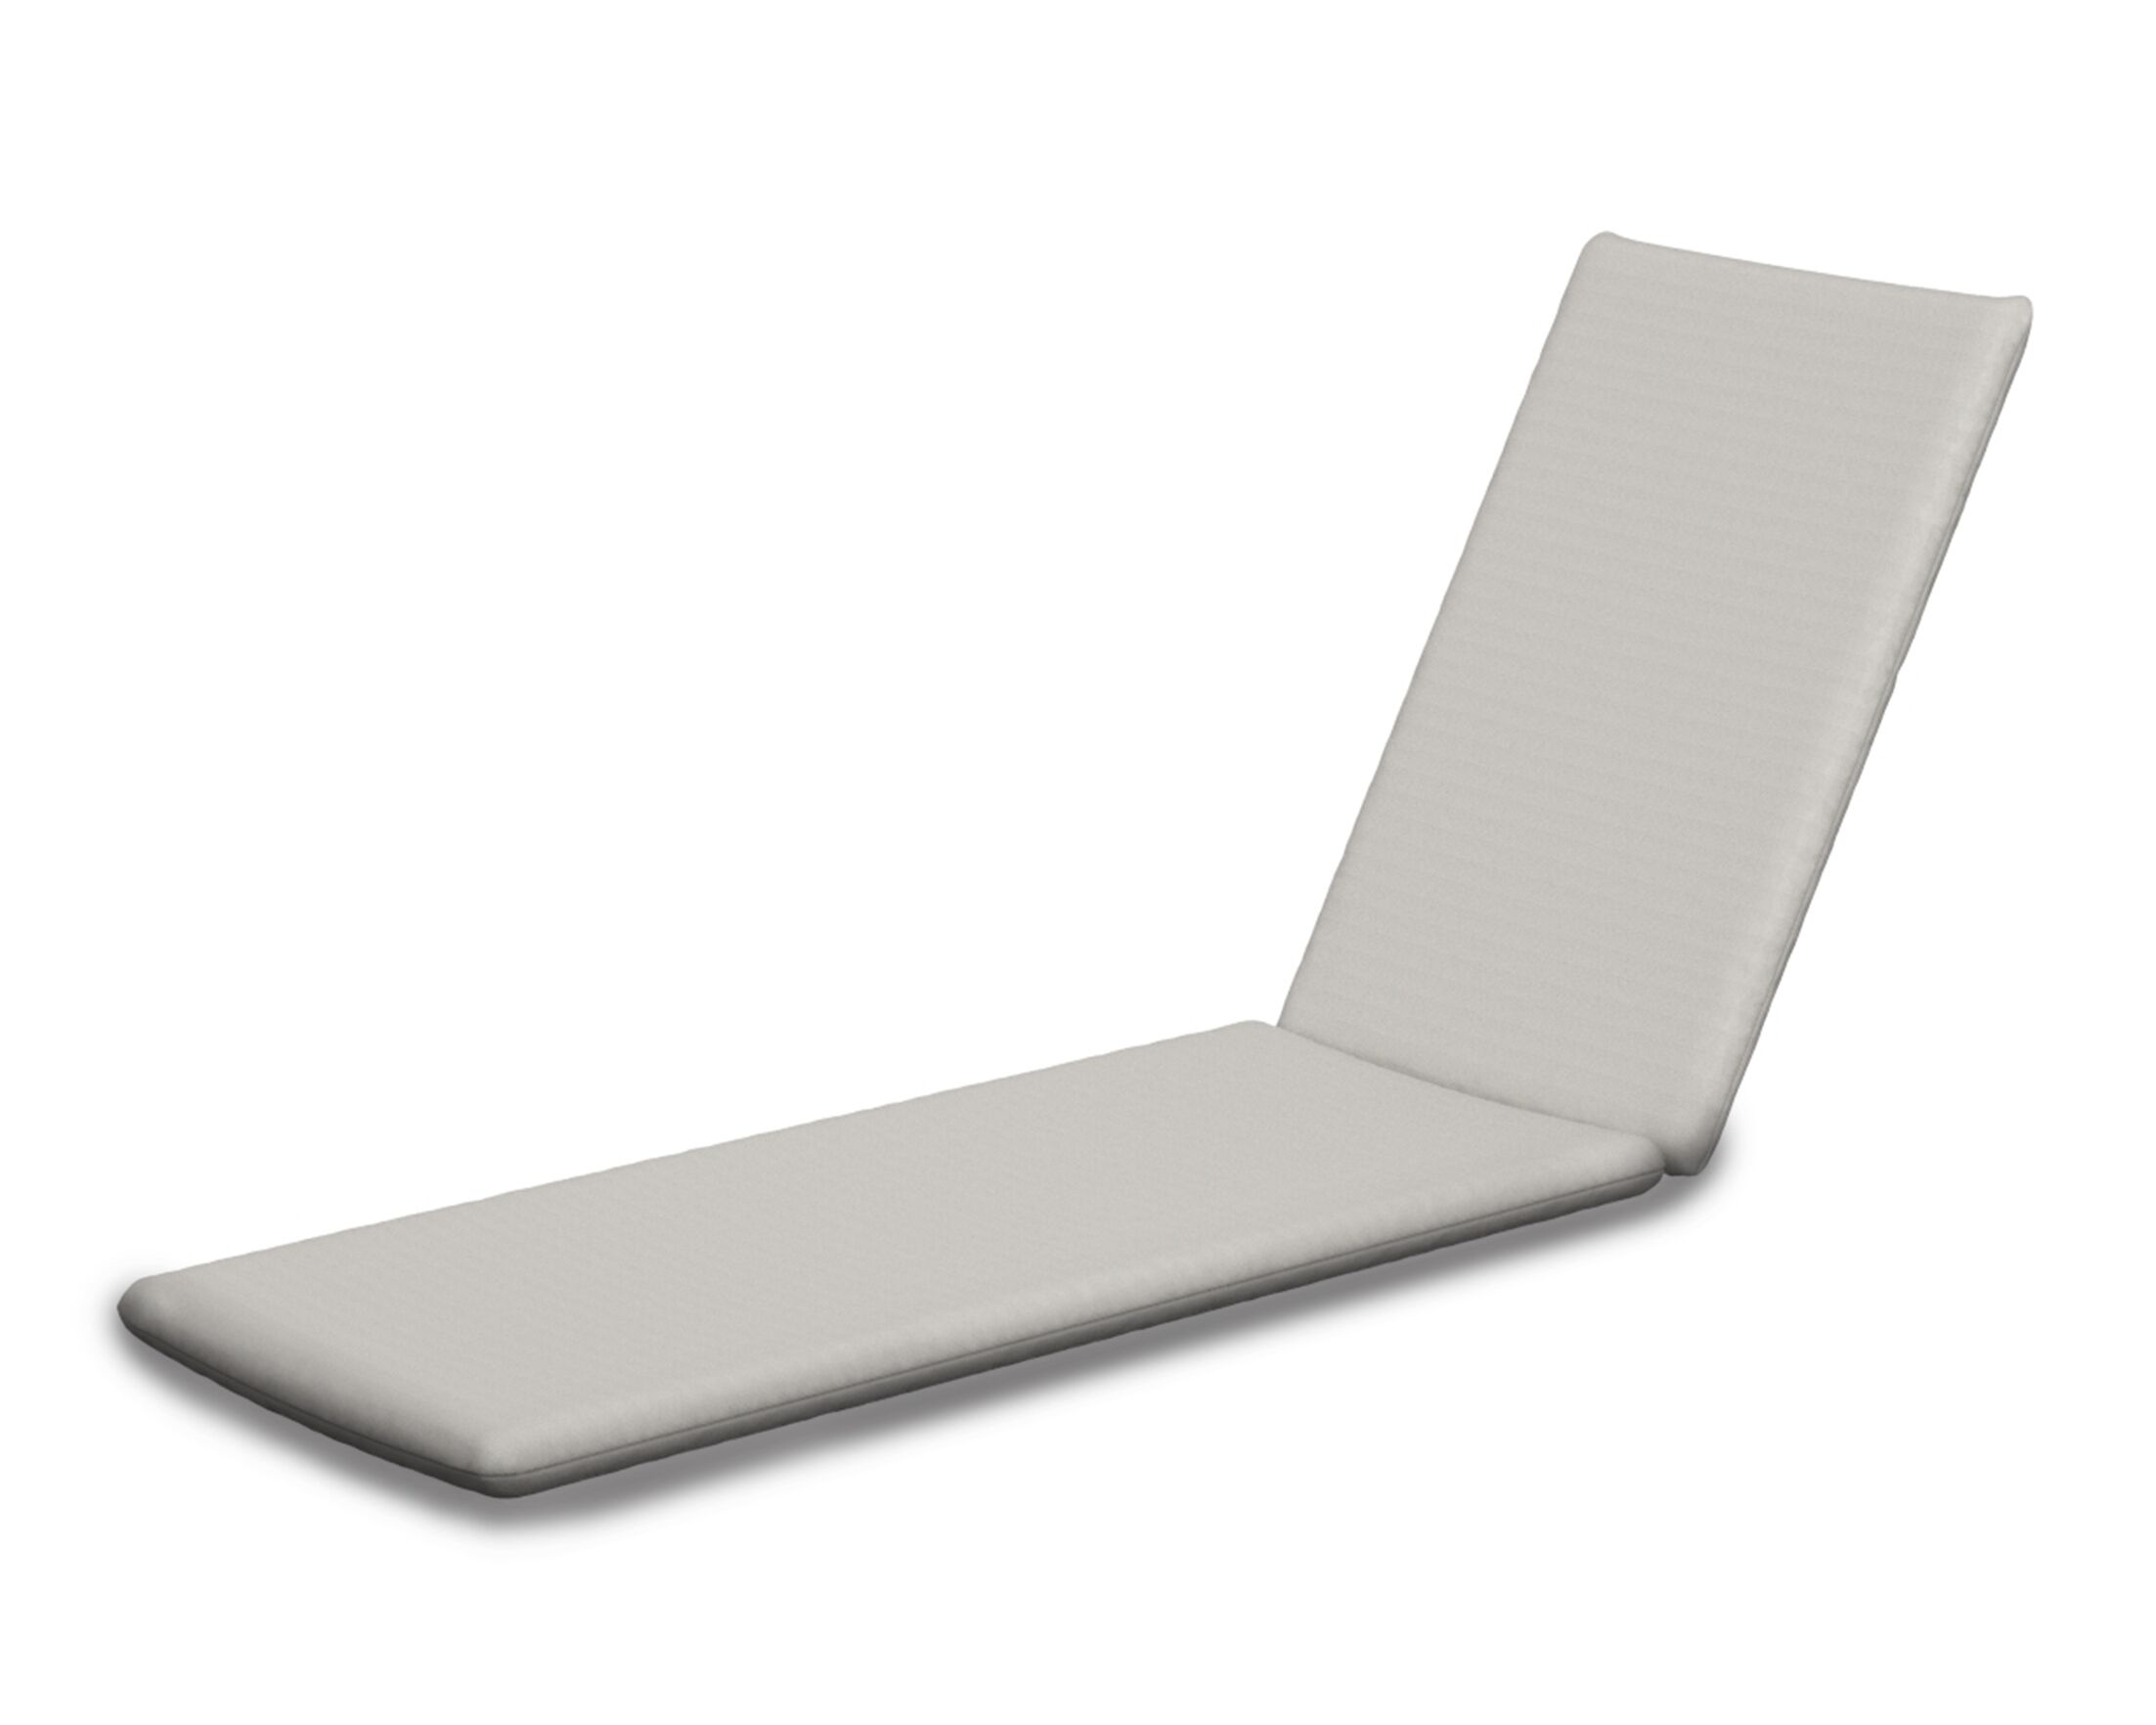 Indoor/Outdoor Sunbrella Chaise Lounge Cushion Fabric: Bird's Eye